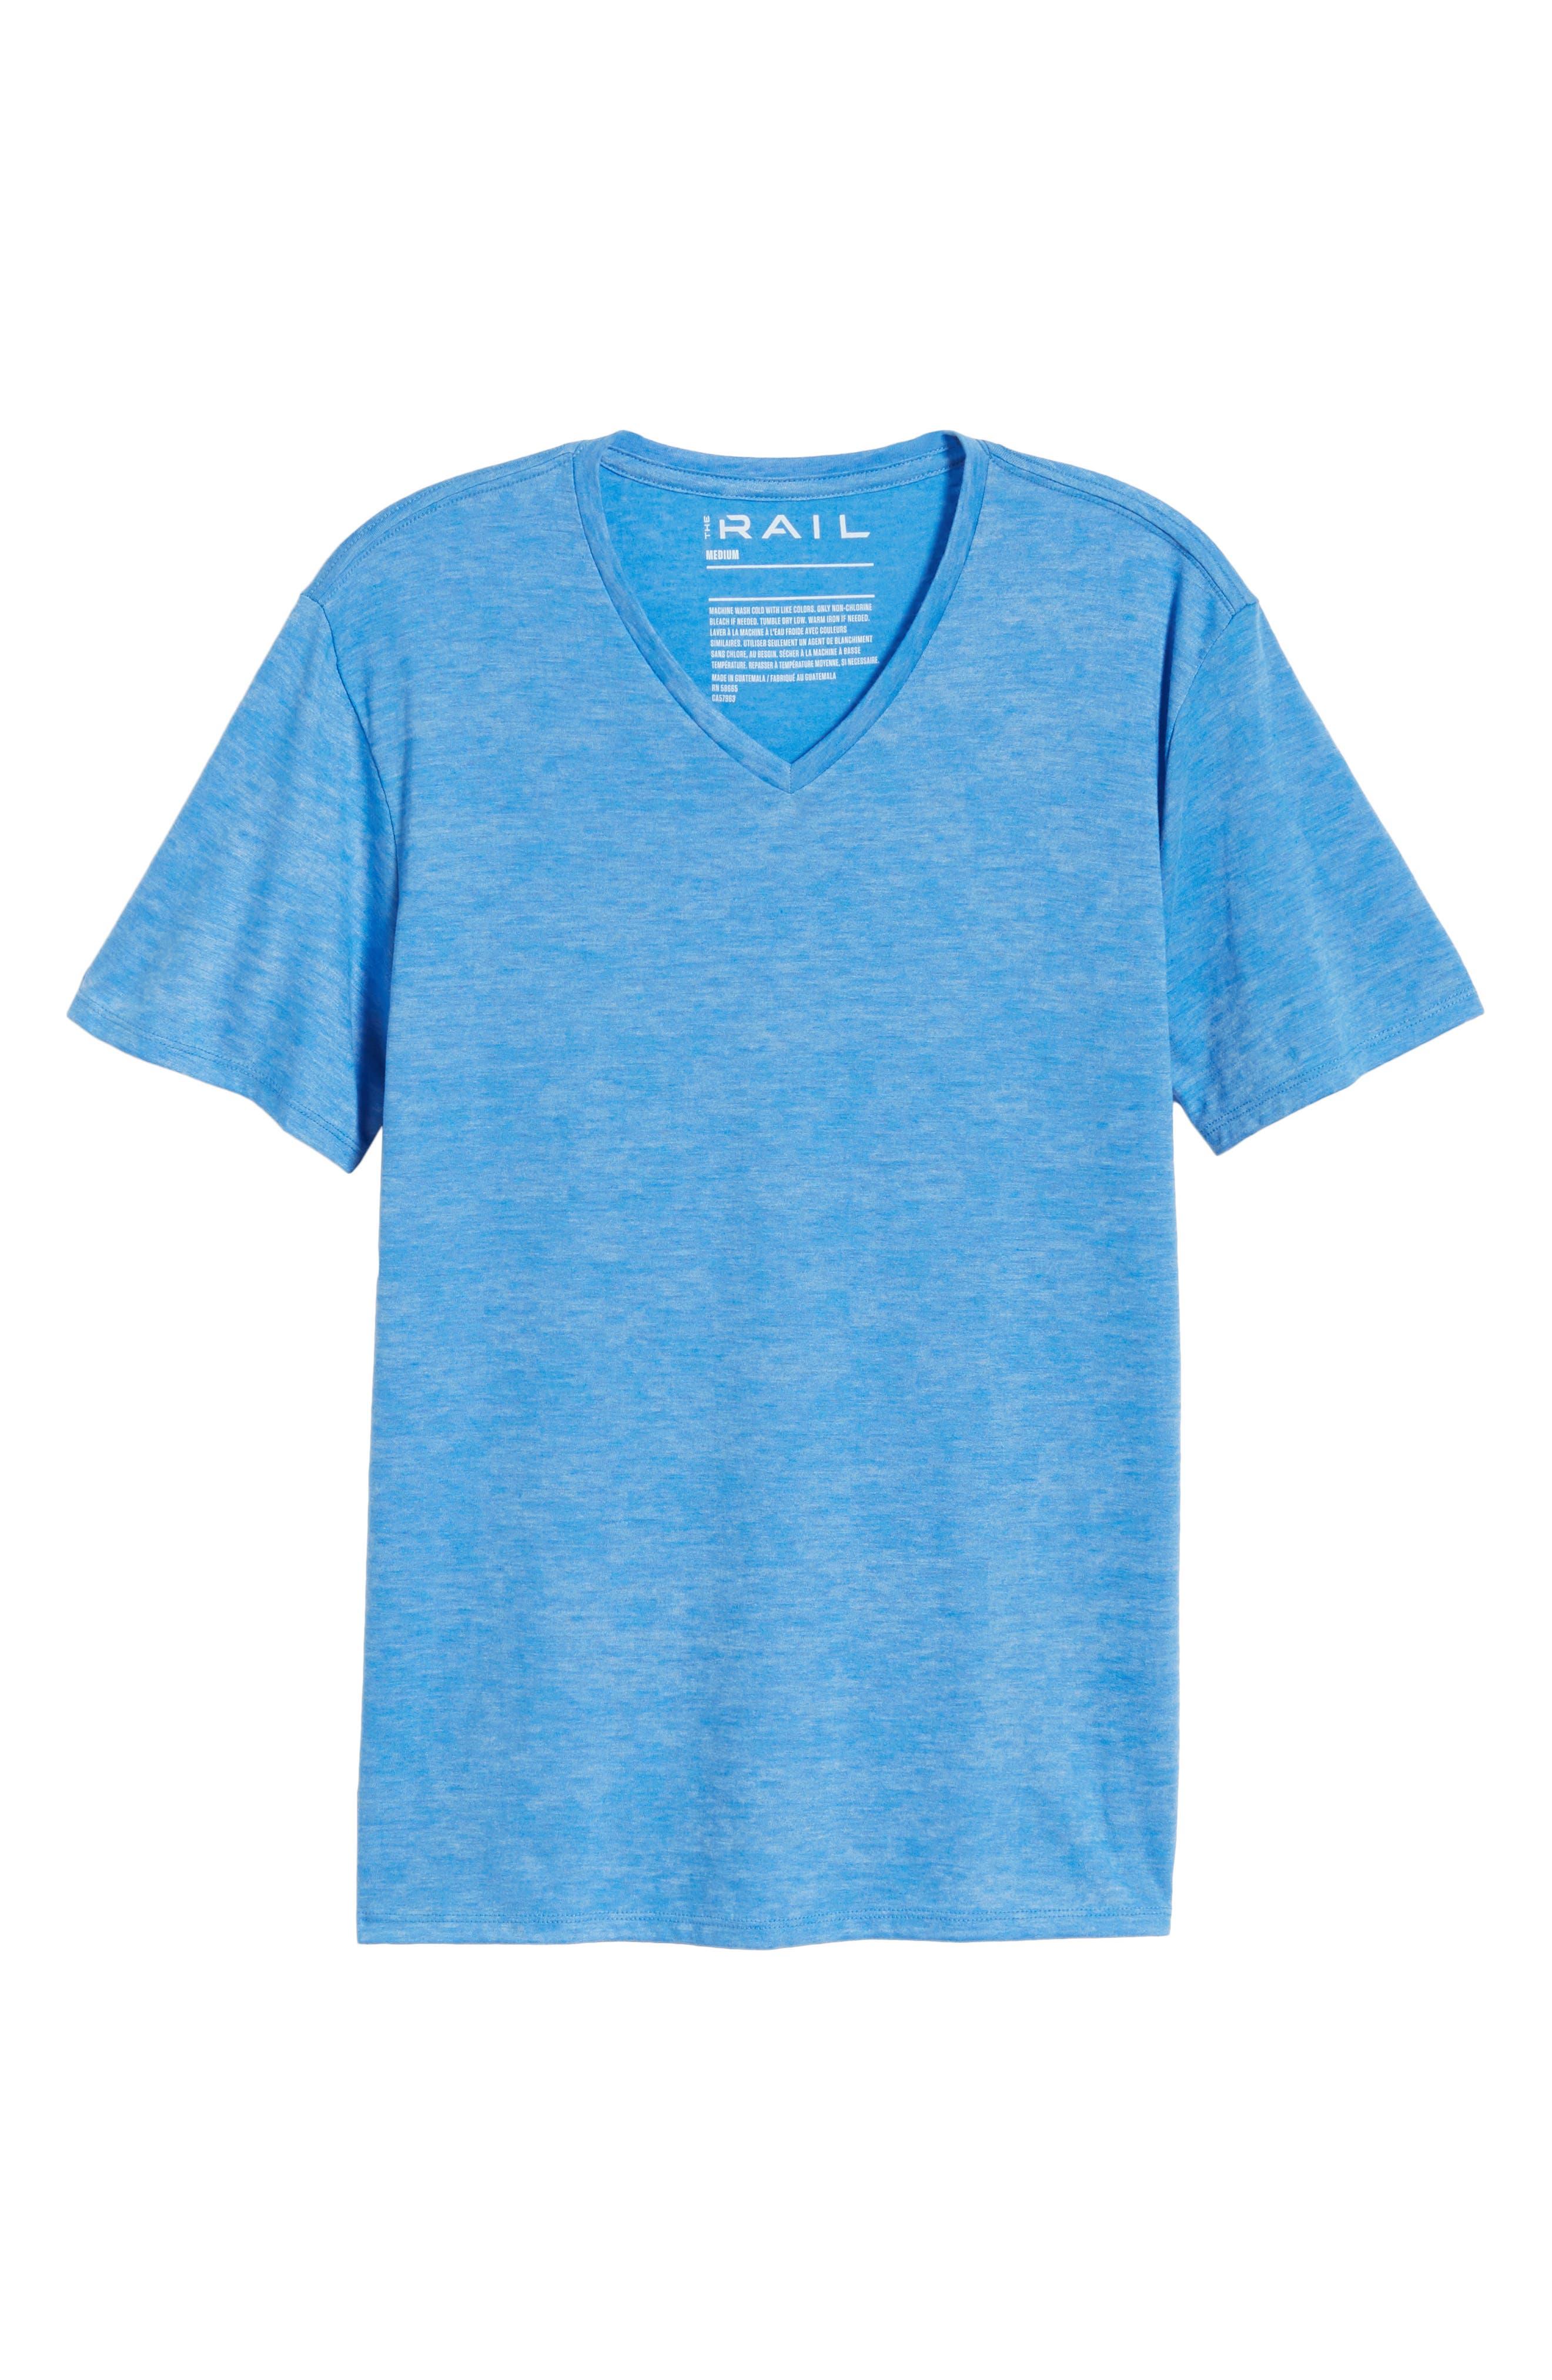 Burnout V-Neck T-Shirt,                             Alternate thumbnail 6, color,                             BLUE BLISS- WHITE BURNOUT